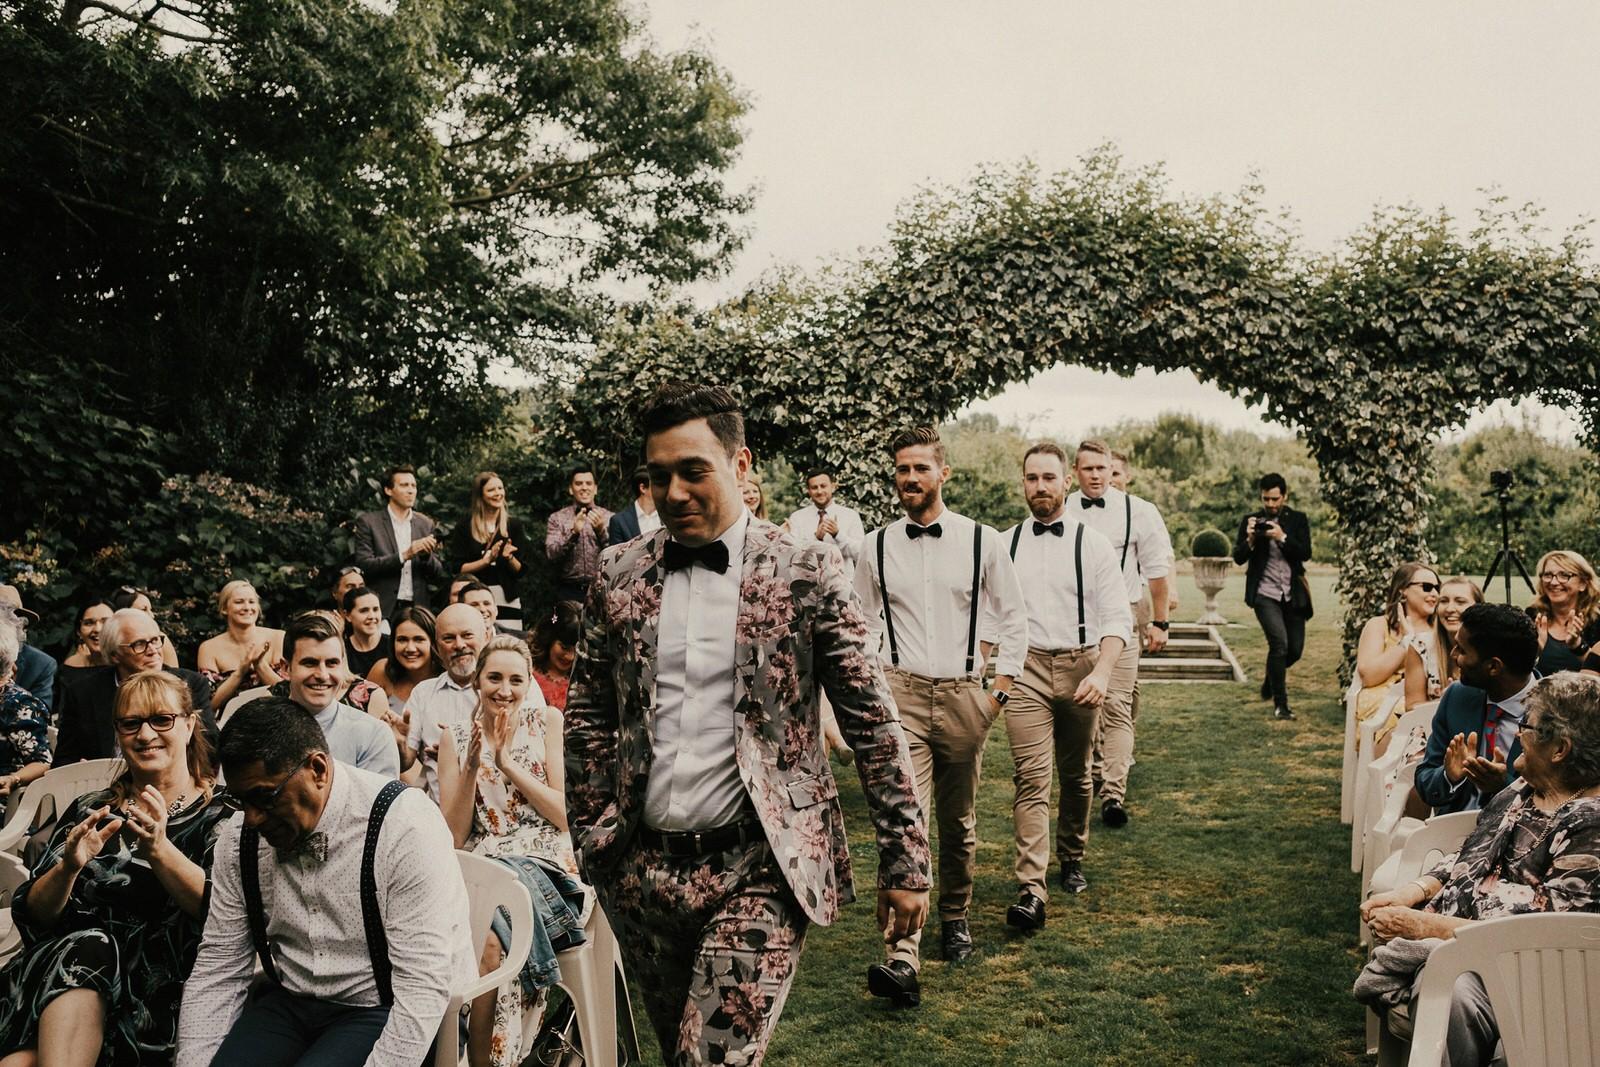 Wairarapa-Wedding_The-Landing_031.JPG